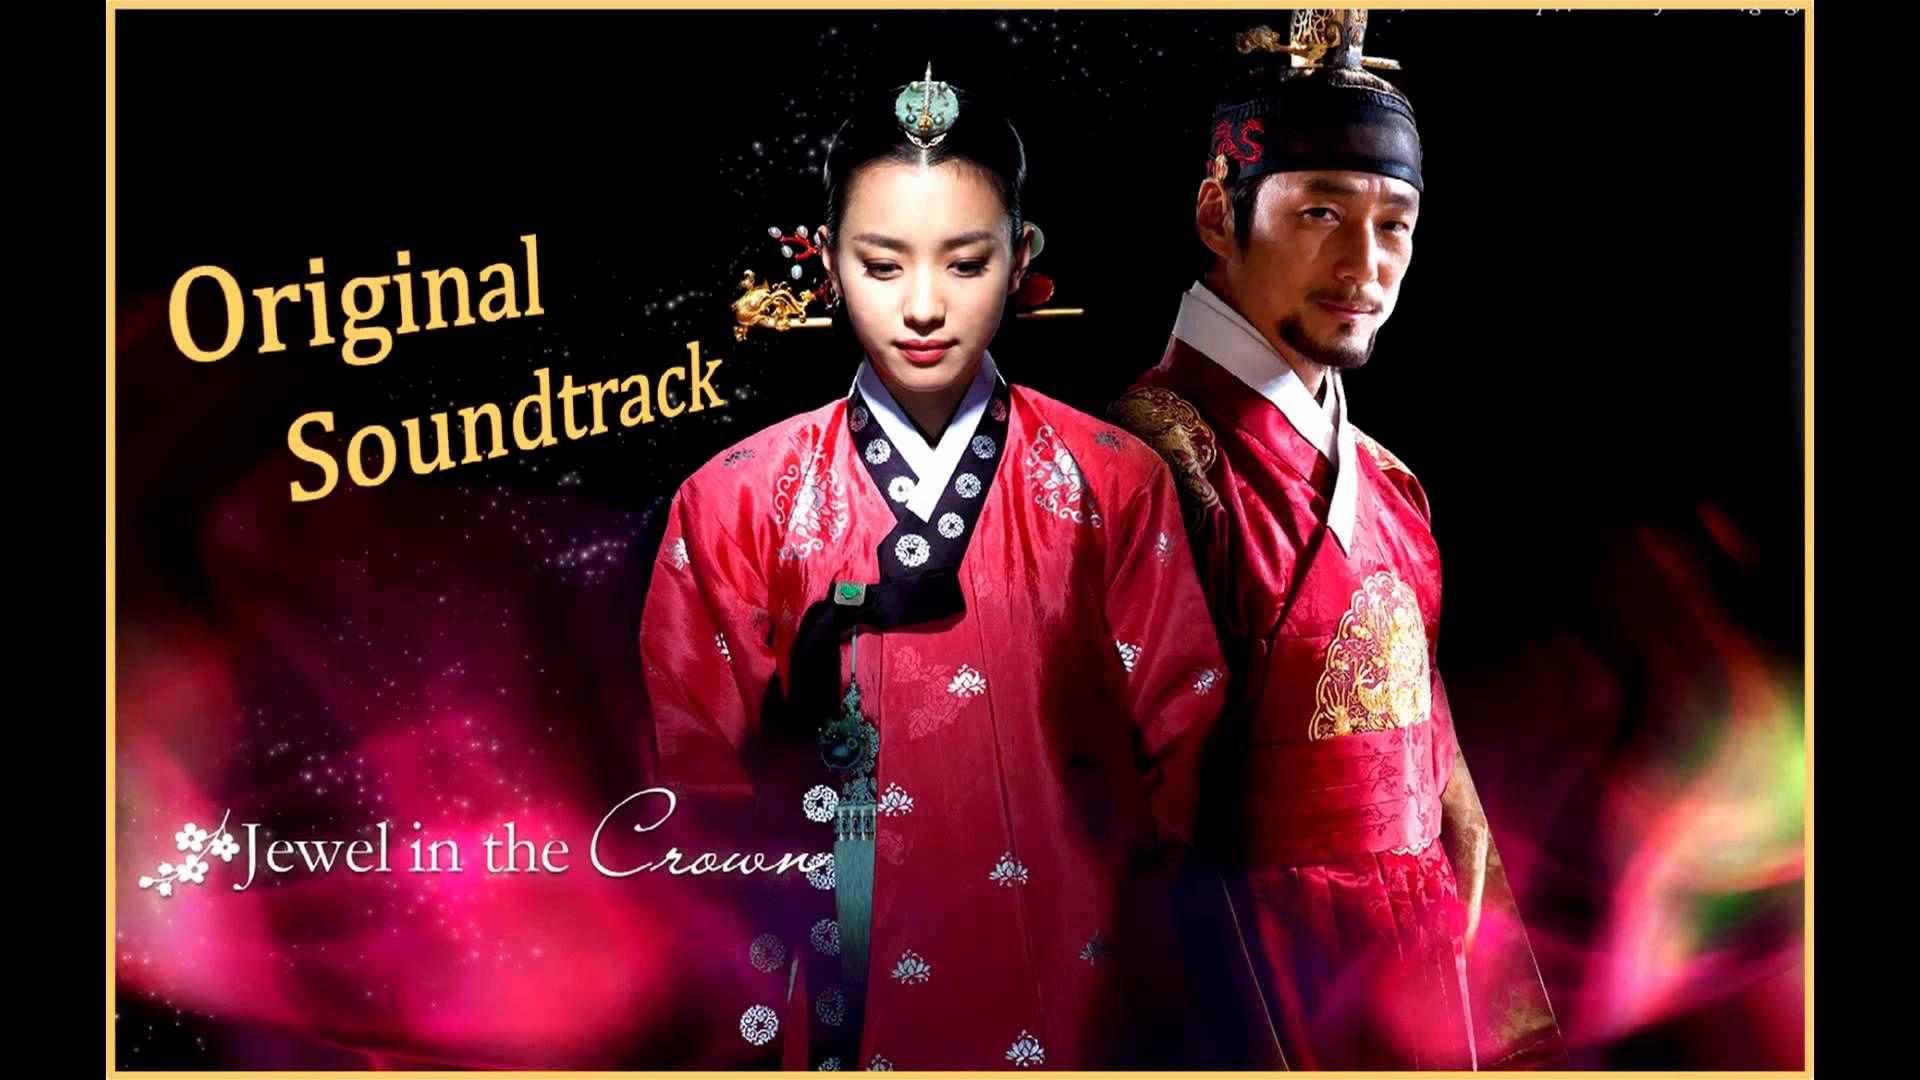 Swallow The Sun Korean Drama Songs - colqknowledge's diary